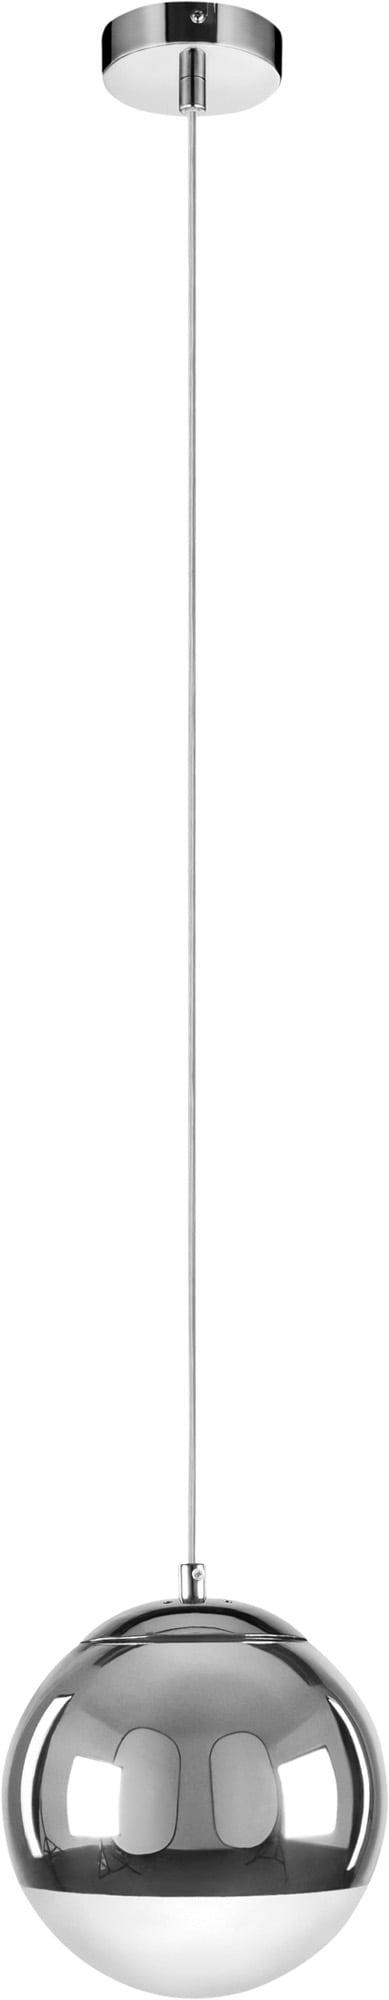 Single hanging lamp Gino chrome E27 60W